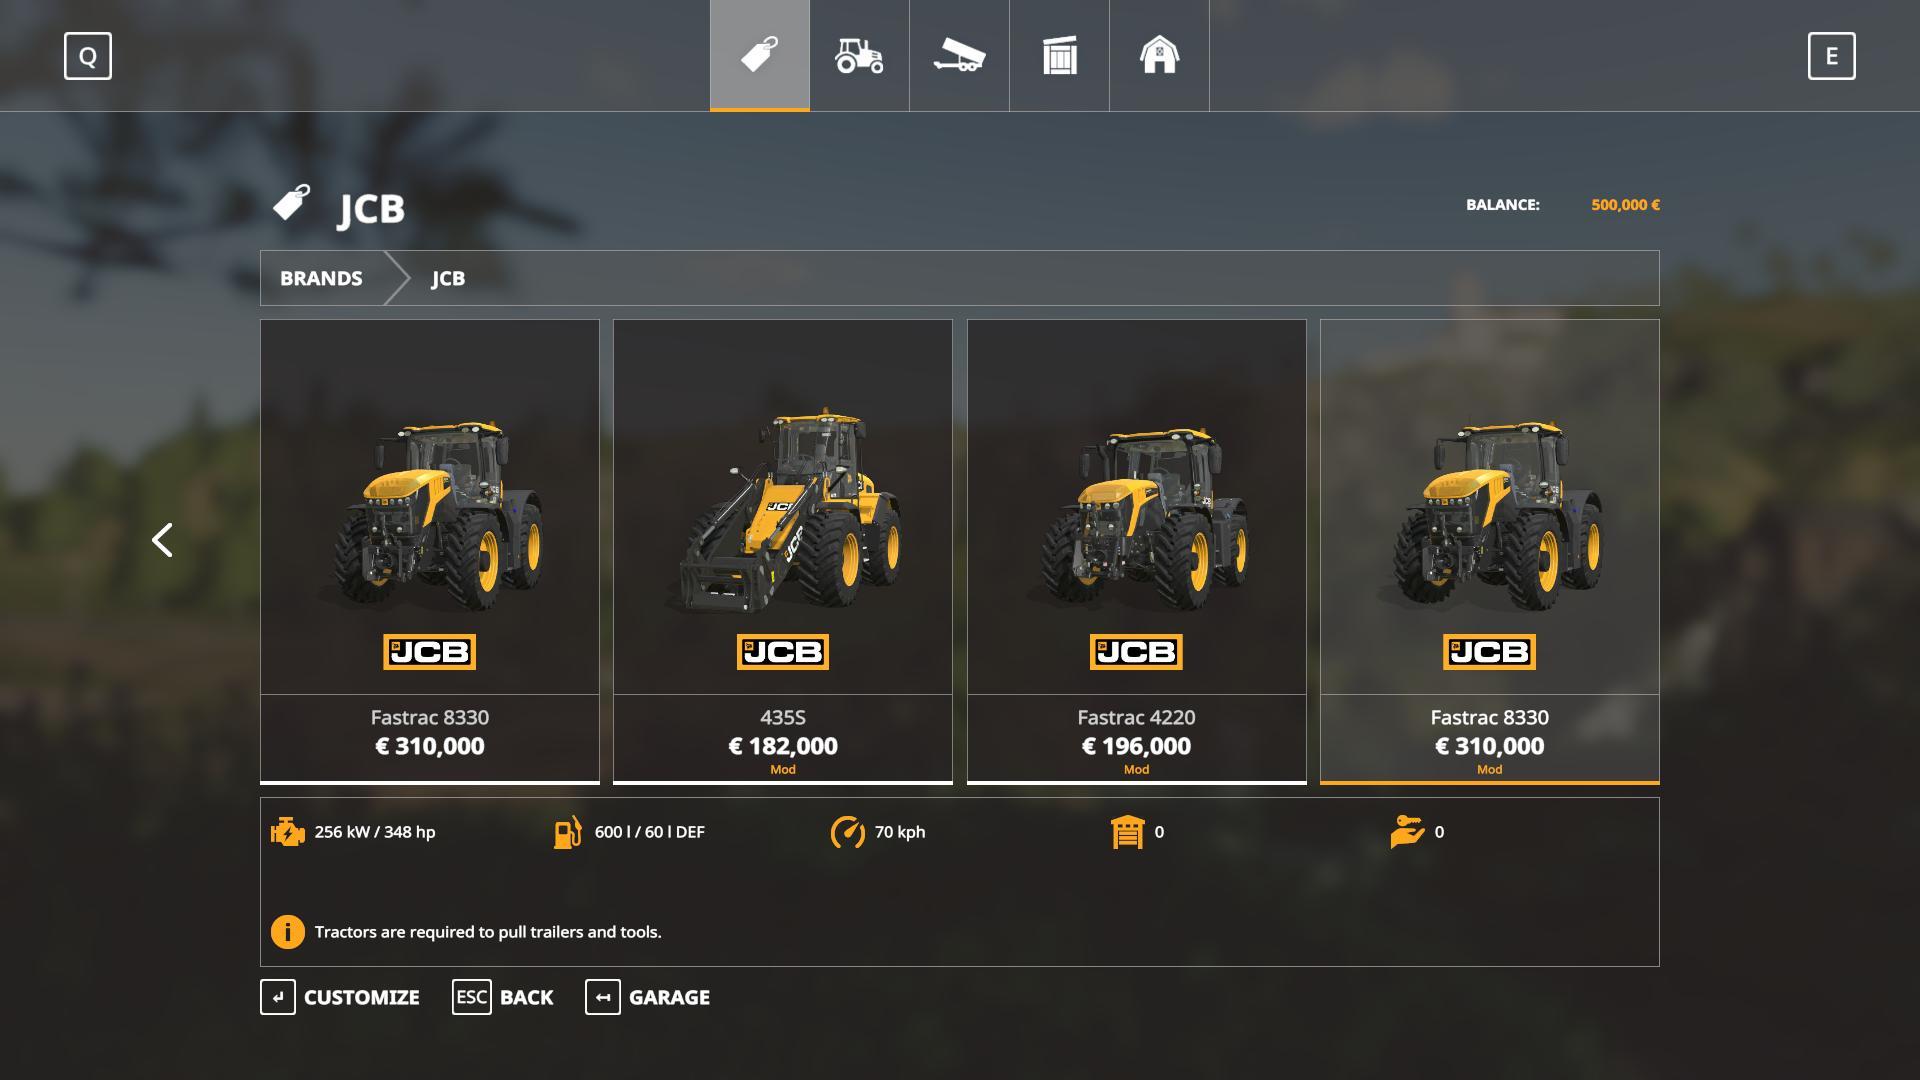 Jcb Tractors v 1.0.0.2